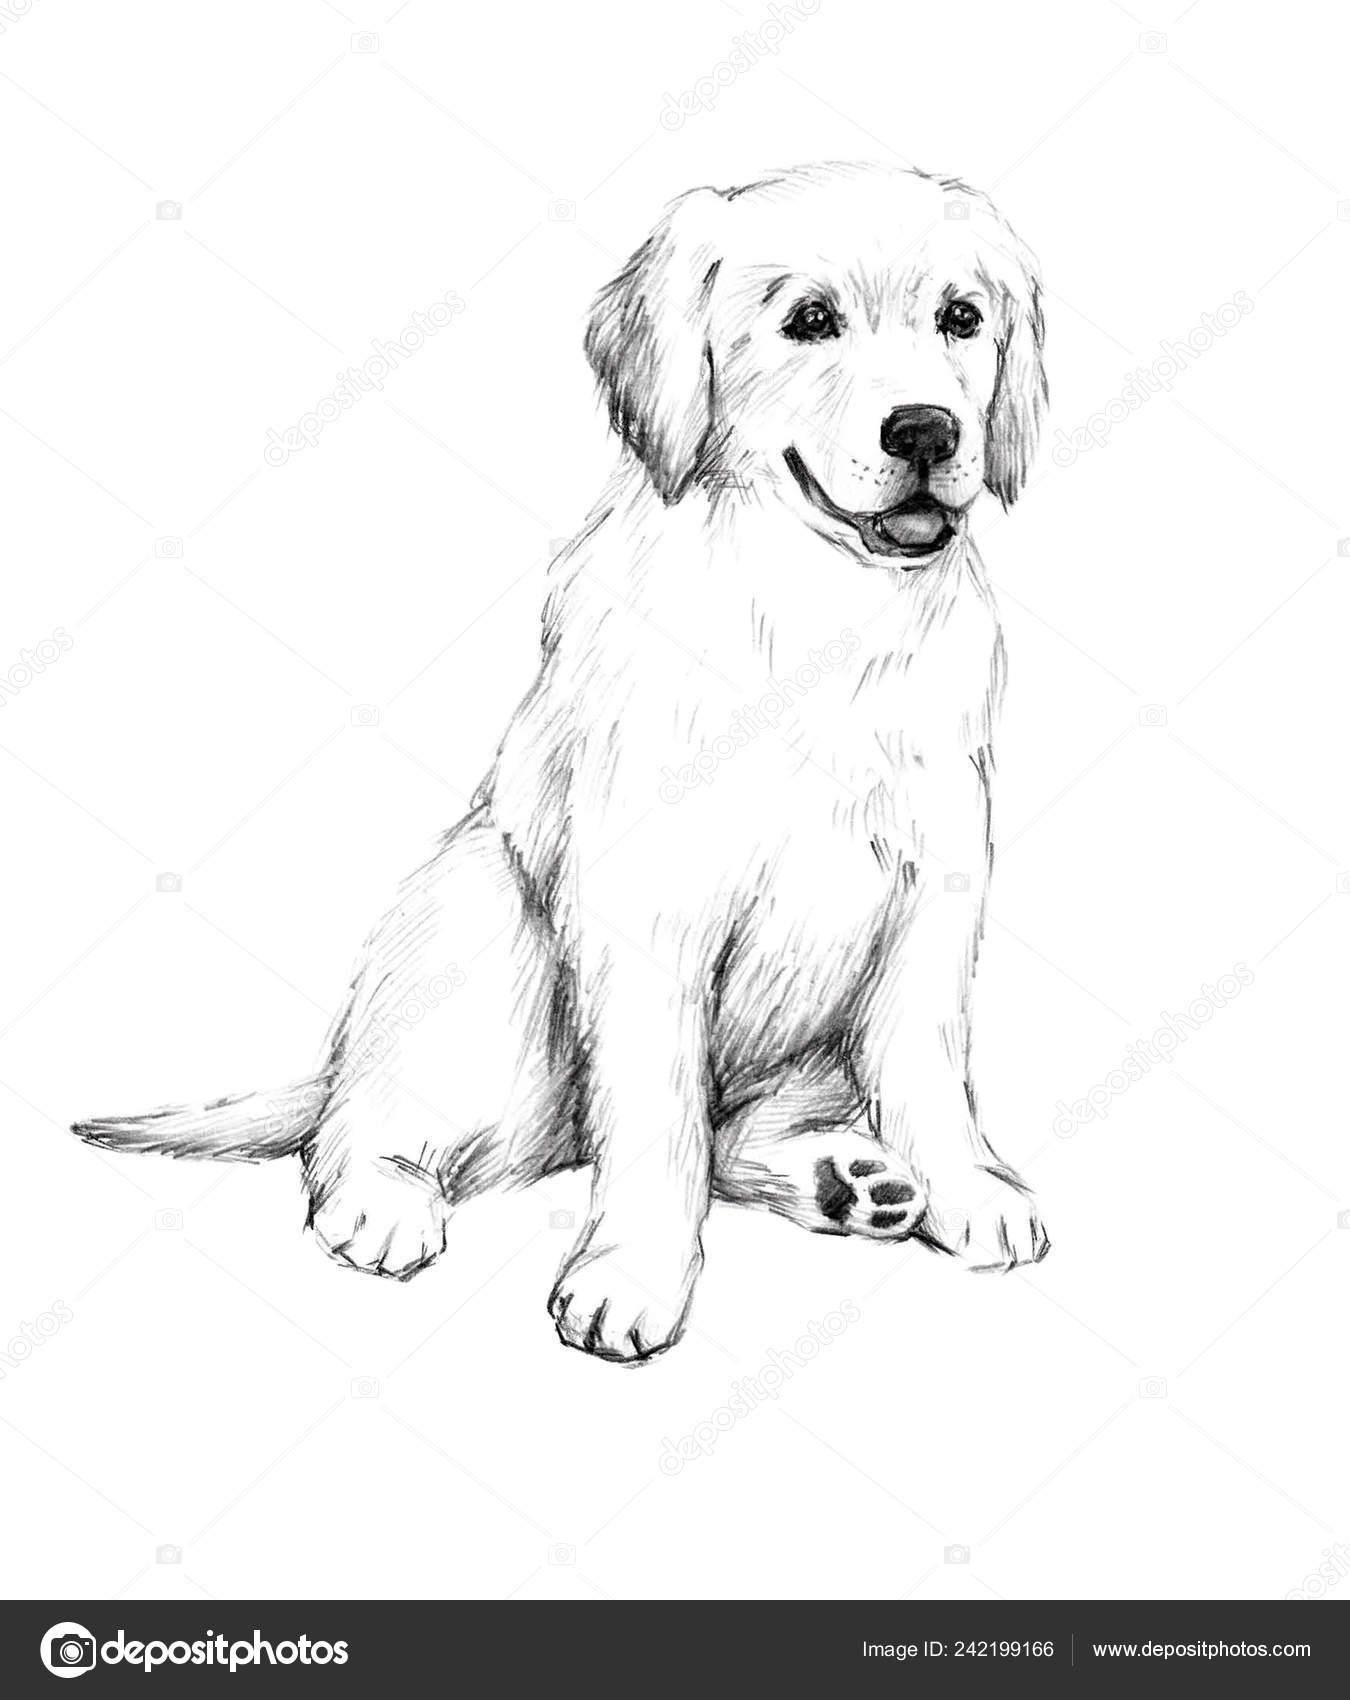 https depositphotos com 242199166 stock photo animal sketch pencil drawing dog html